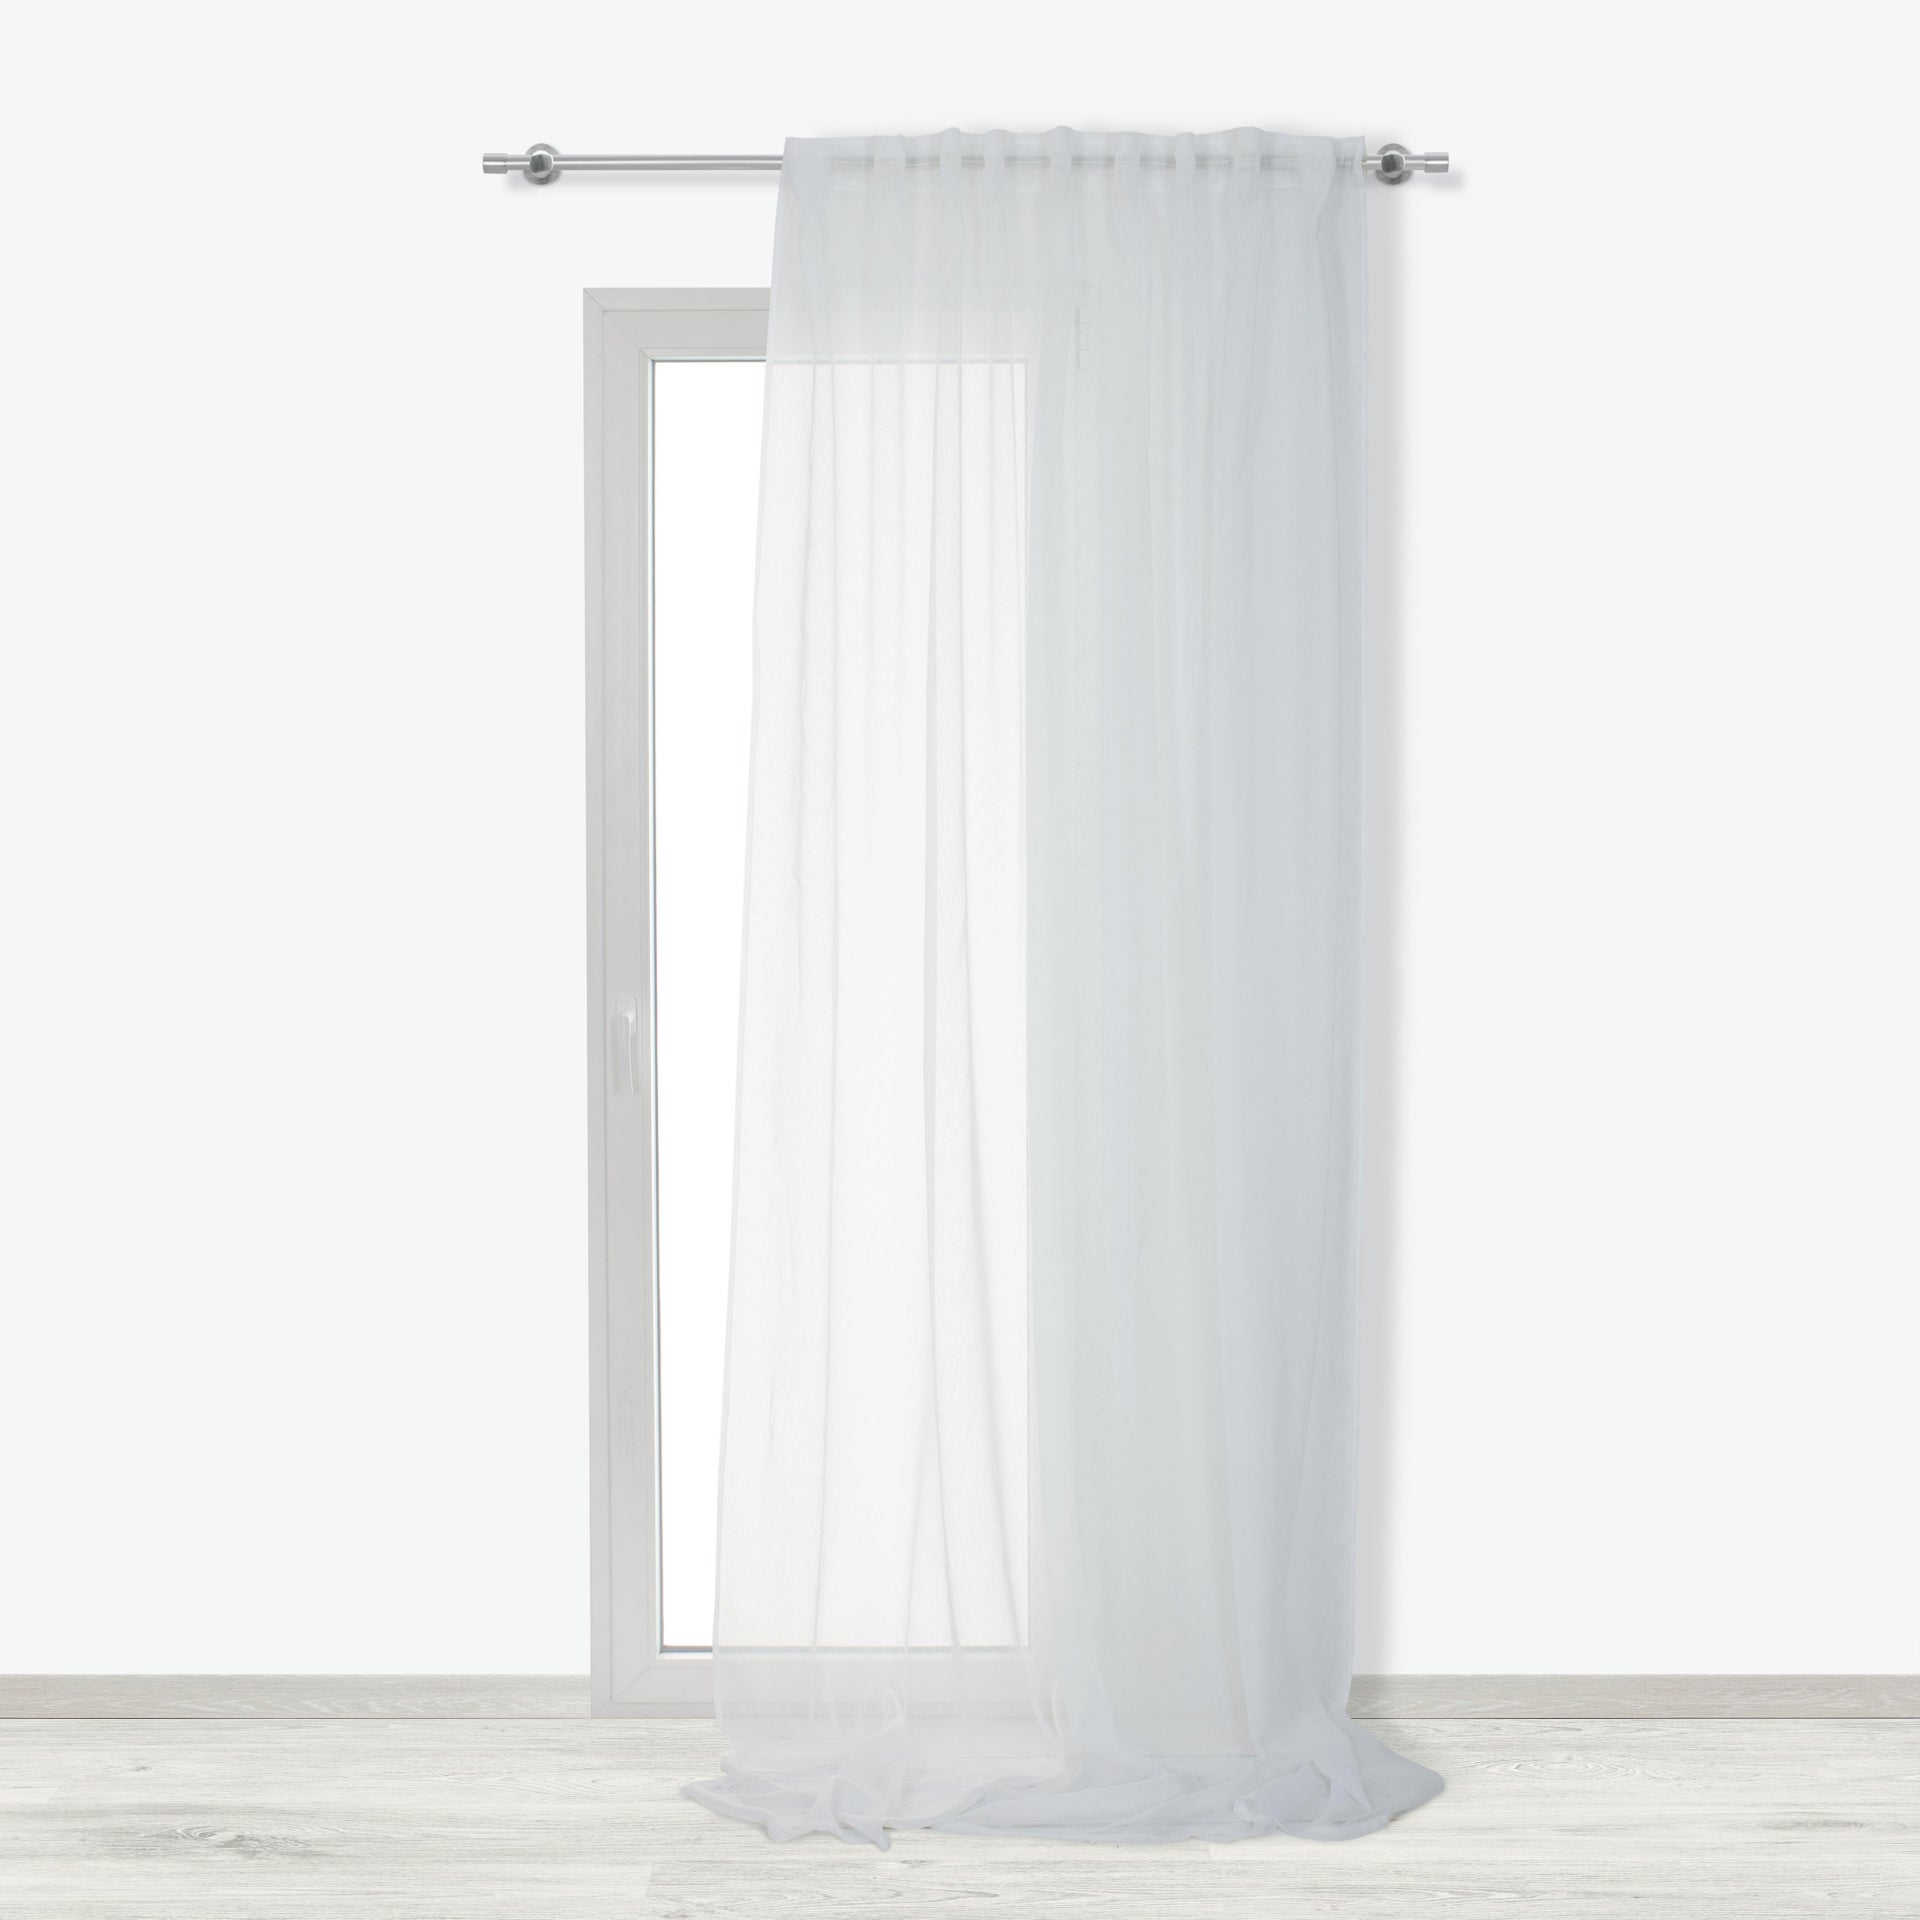 Tenda INSPIRE Softy bianco fettuccia e passanti 200 x 280 cm - 4